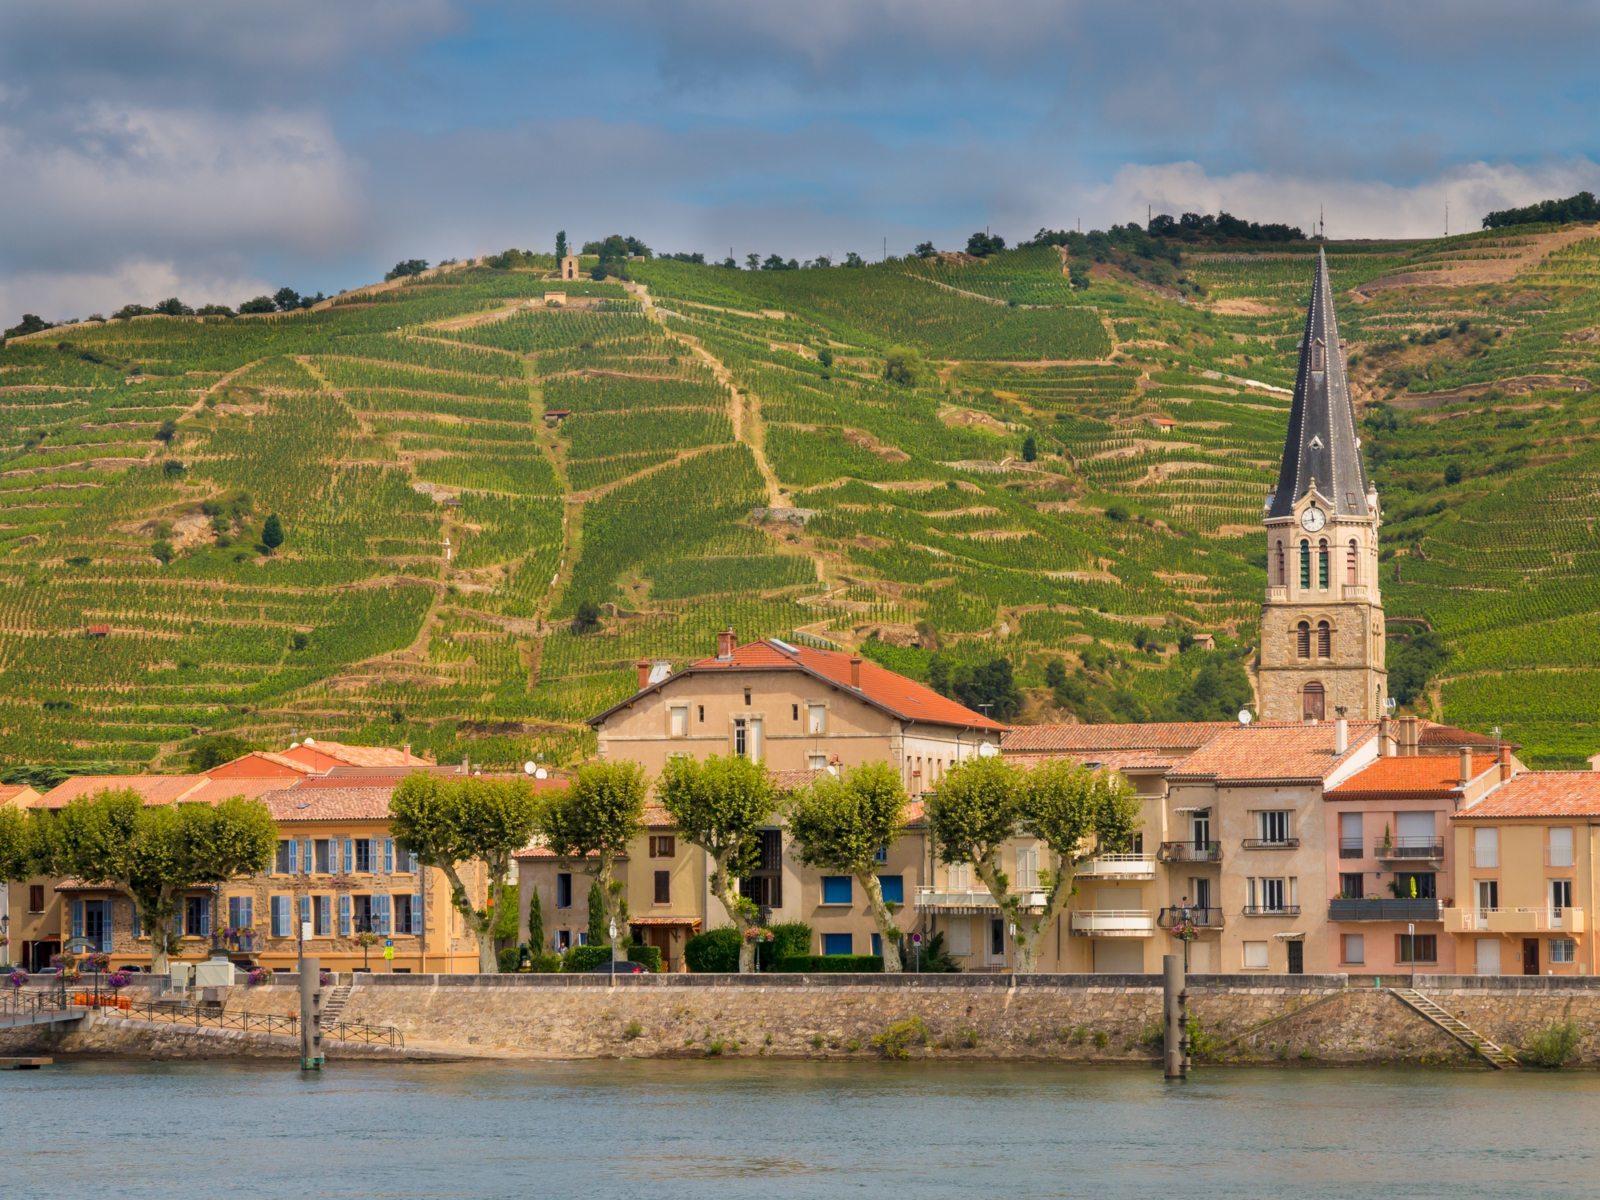 decouvrir-regions-provence-avignon-alpilles-luberon-camargue-vallee-du-rhone